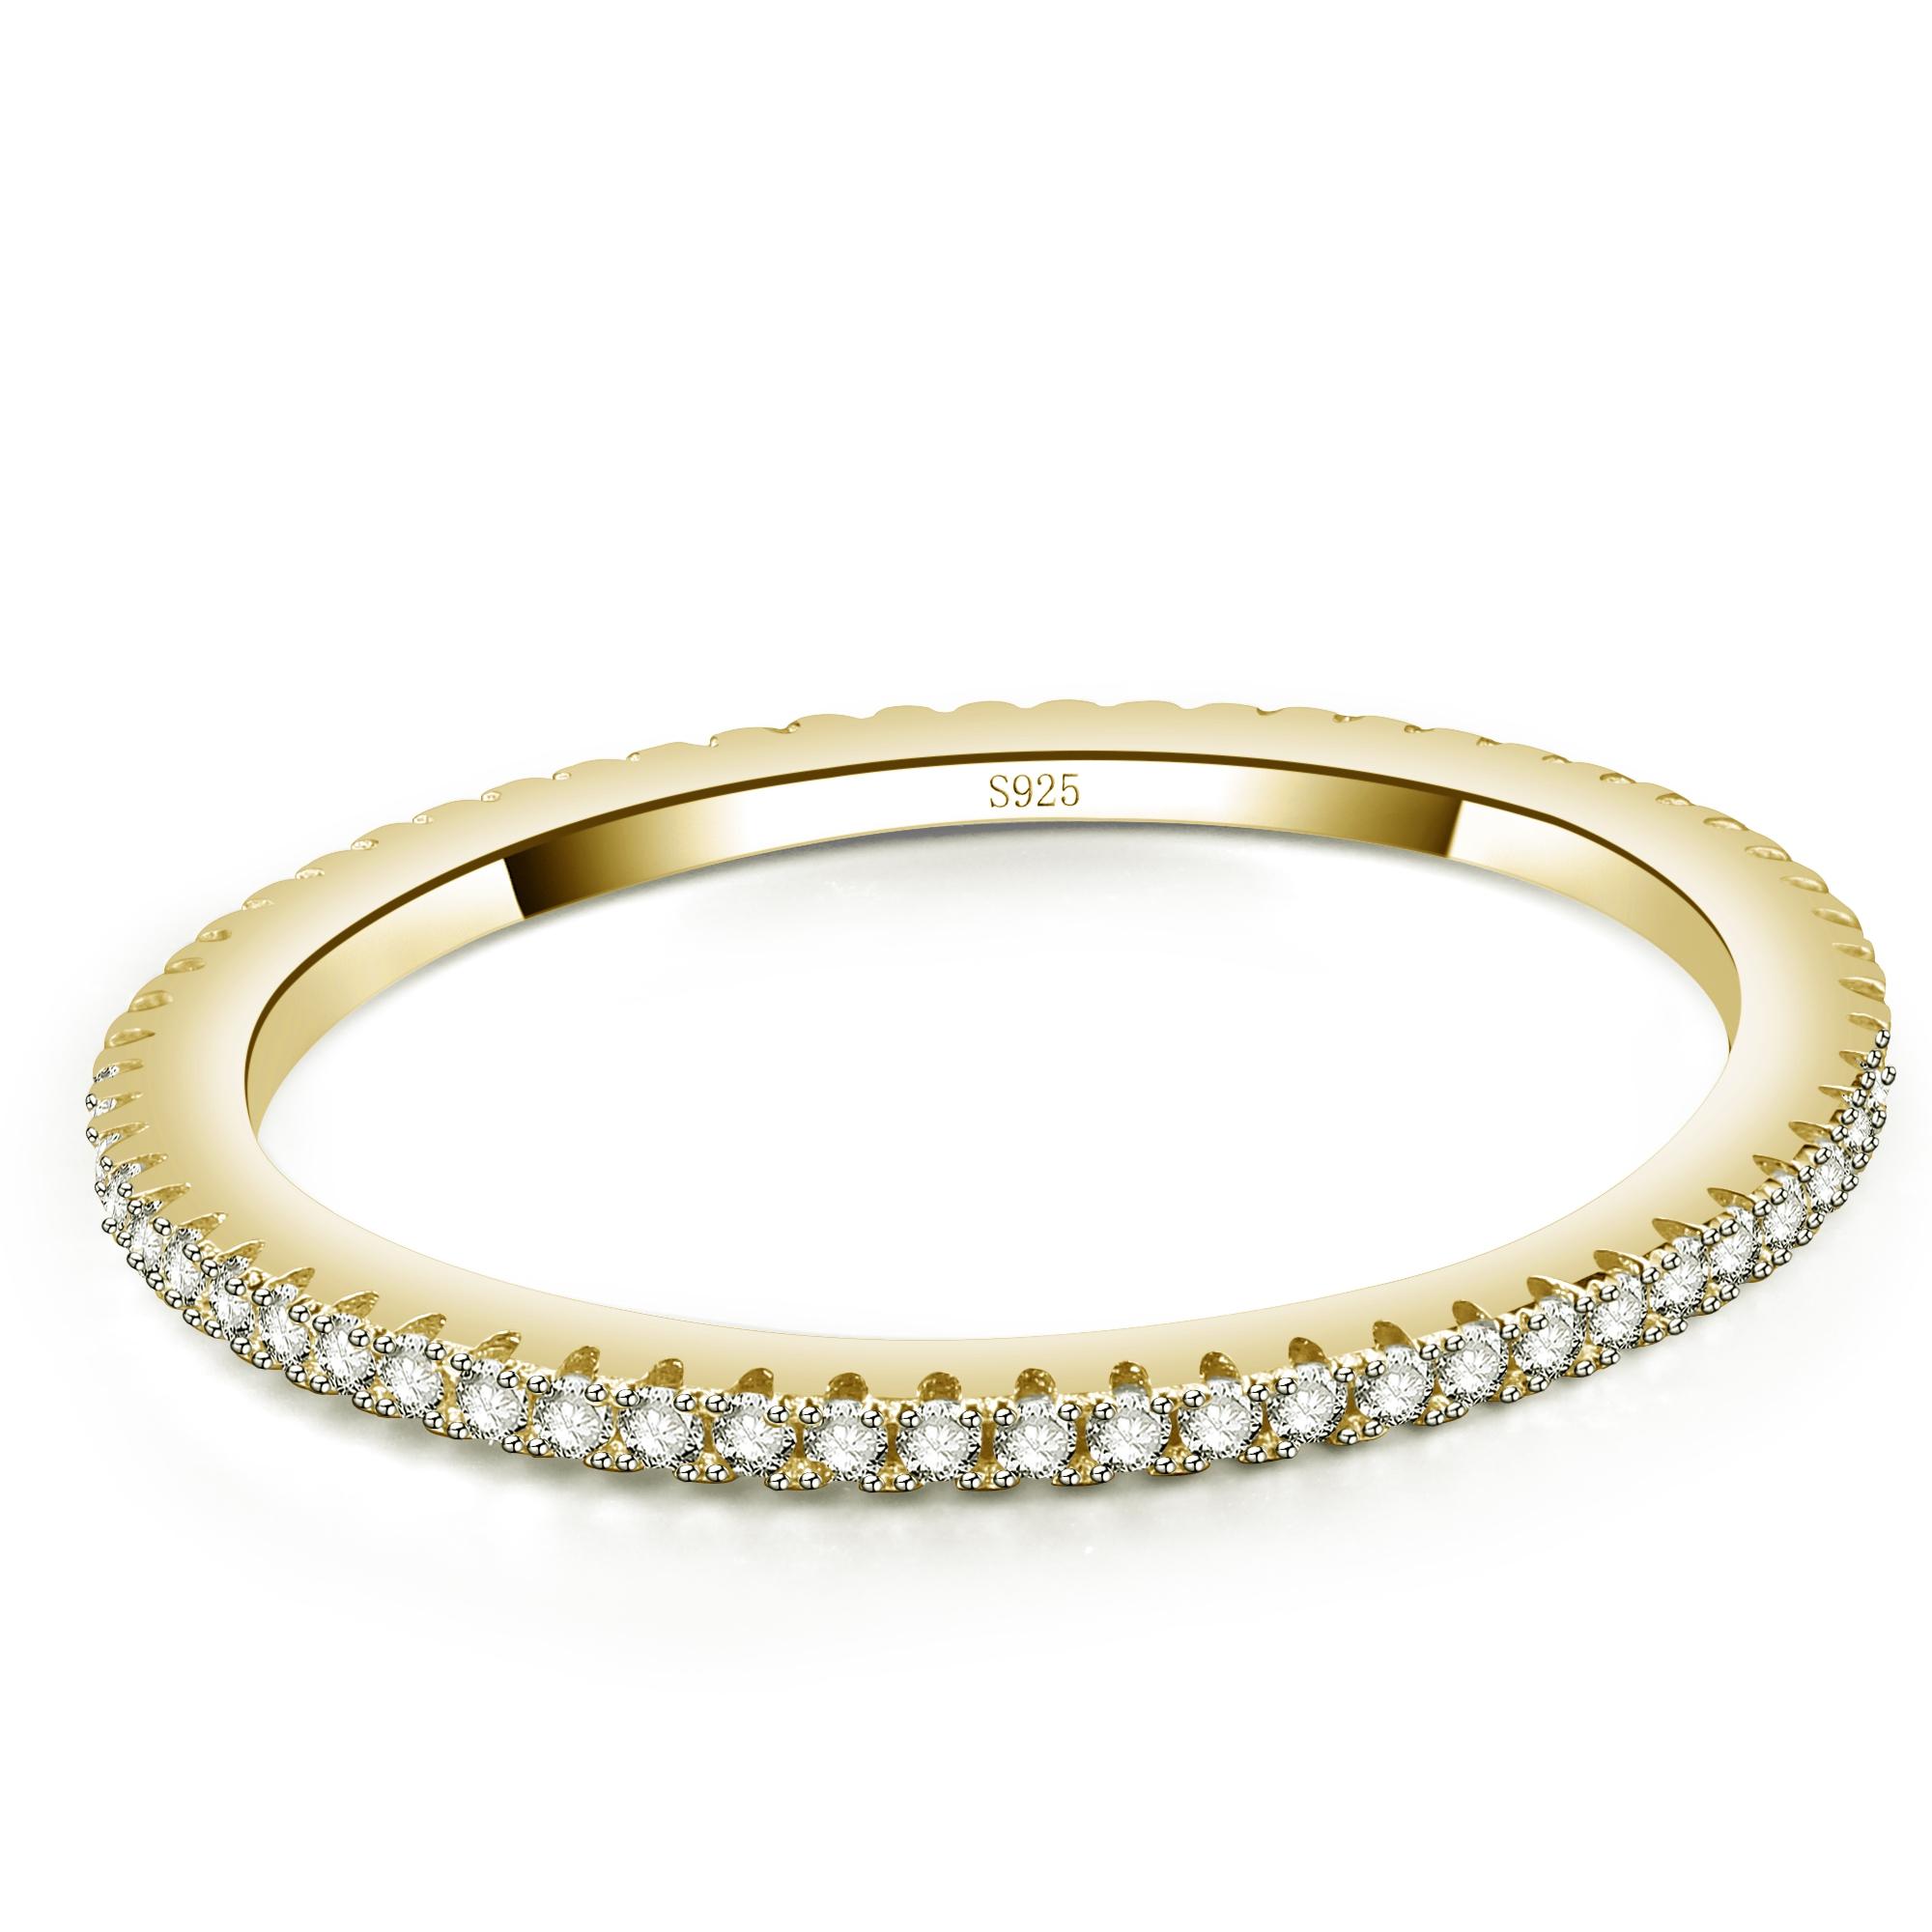 50 52 54 56 58 60 NEU Damen Ring 925er echt Silber Gold mattiert mit Stein Gr